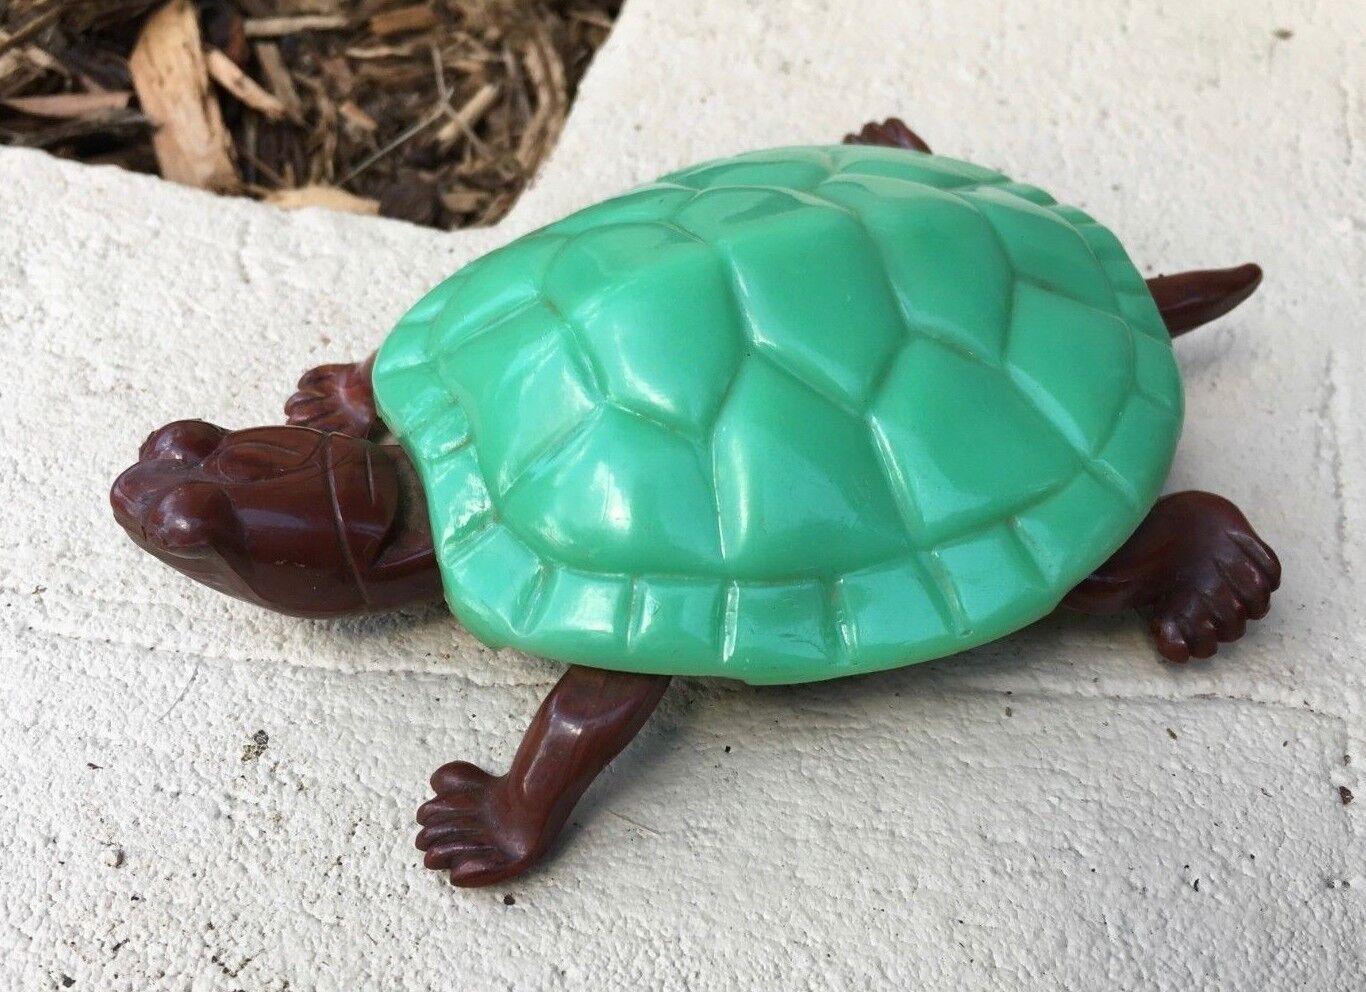 Eppy USA Slowpoke Turtle 1947 Green Shell Brown Body Plastic Vintage Push Toy